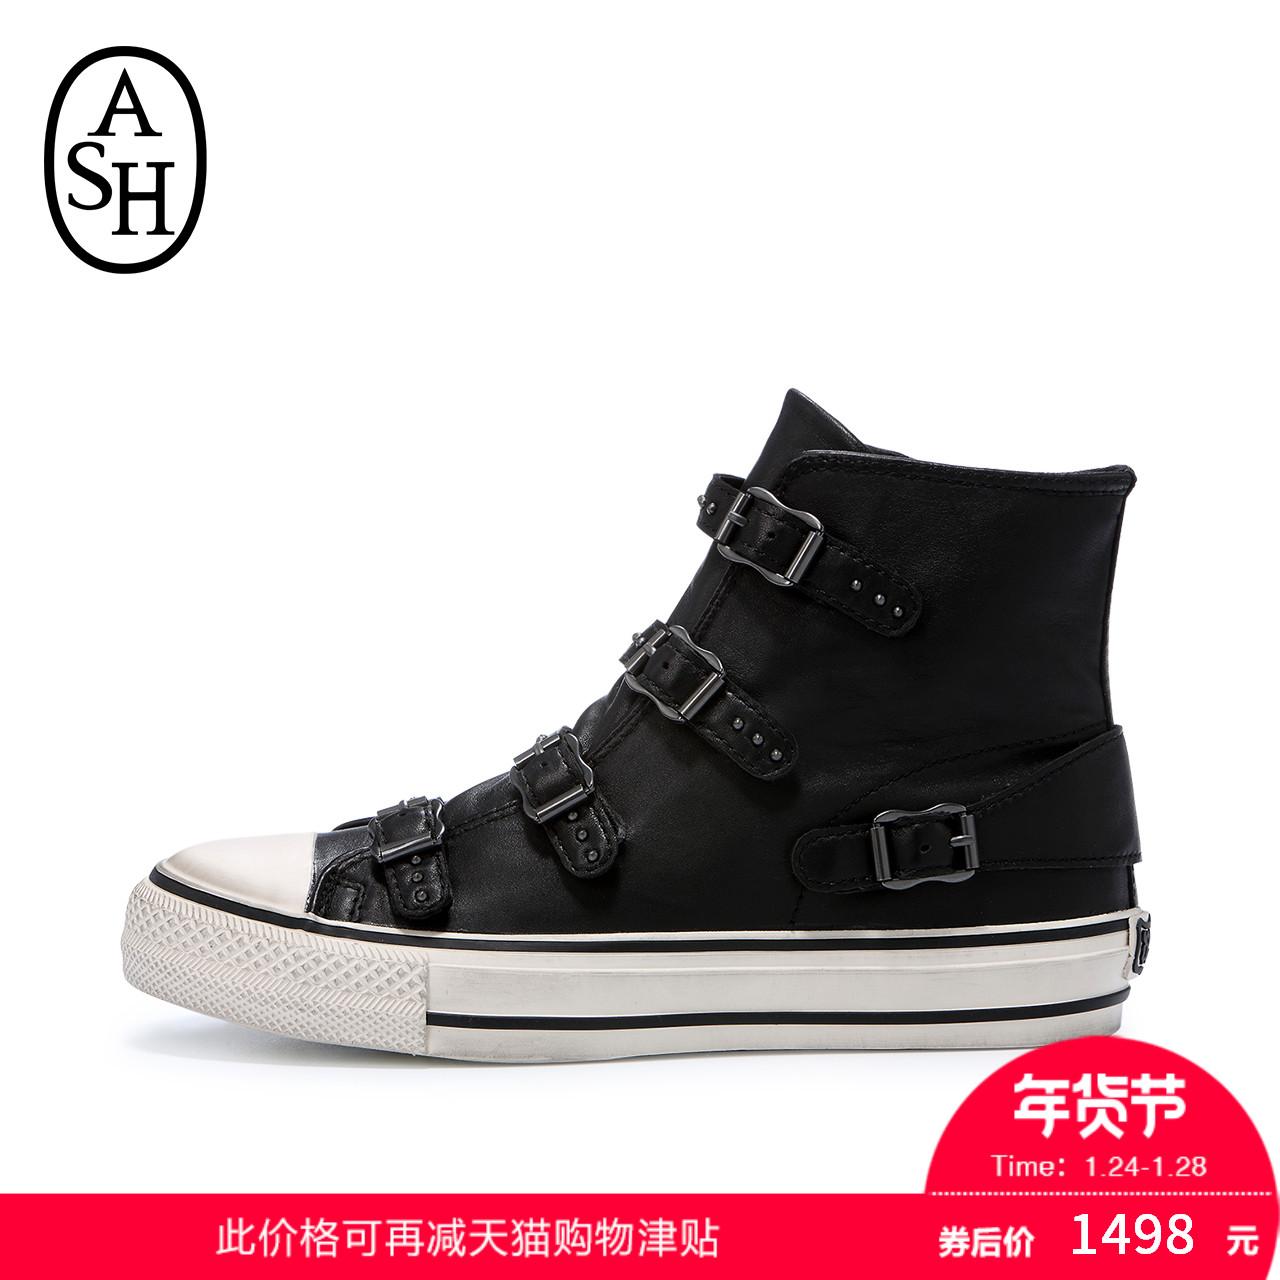 ASH女鞋2017秋冬新品VIRGIN羊皮高帮运动休闲鞋